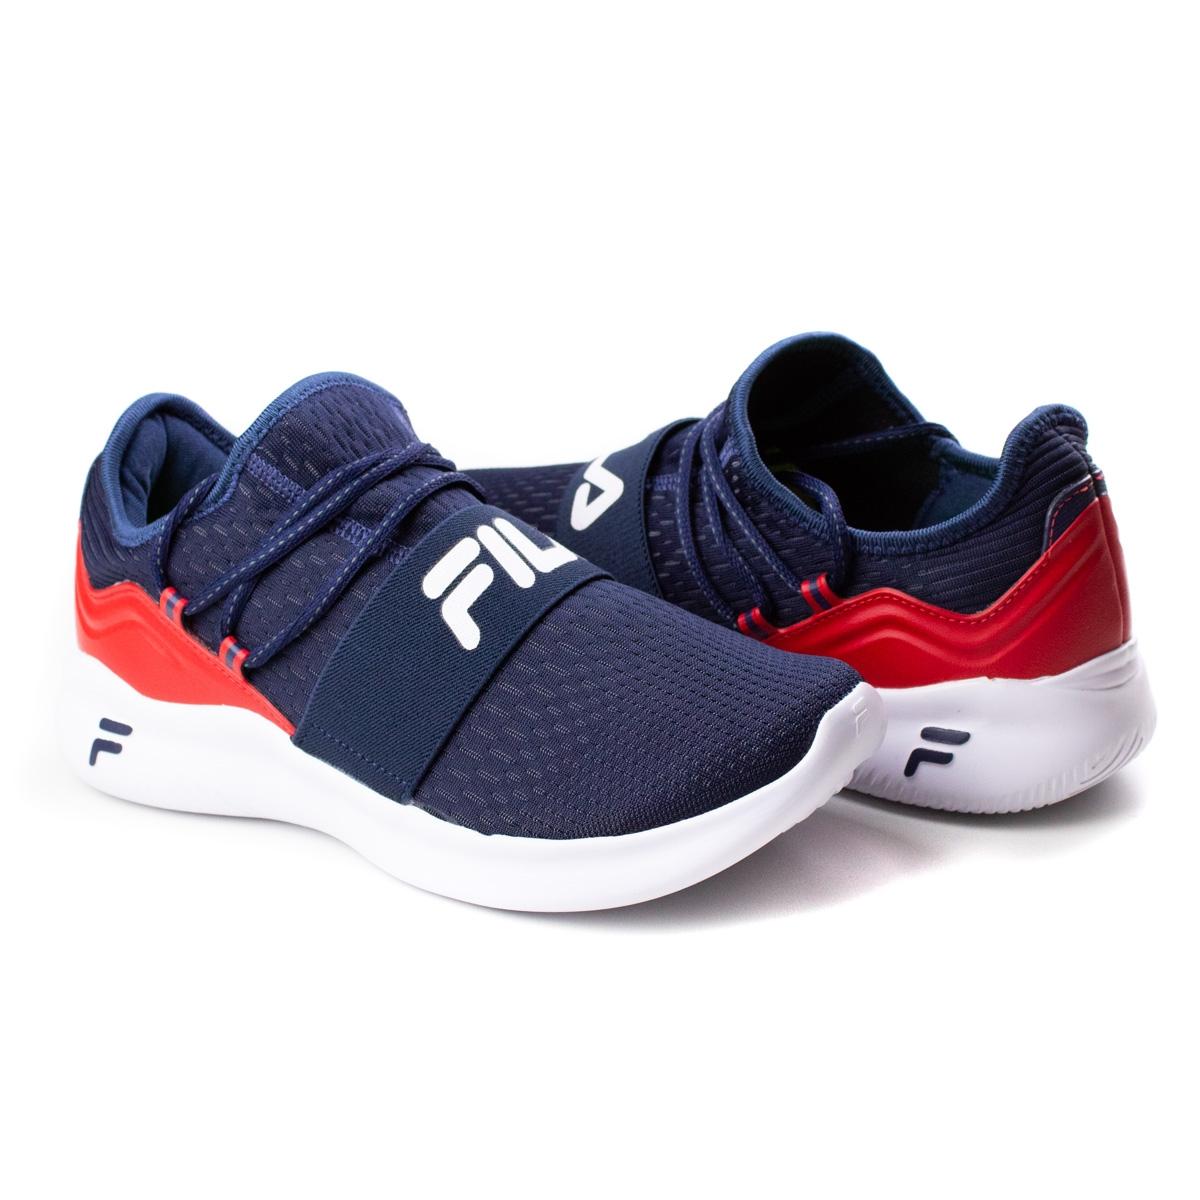 Tênis Masculino Trend Fila - Marinho/vermelho/branco